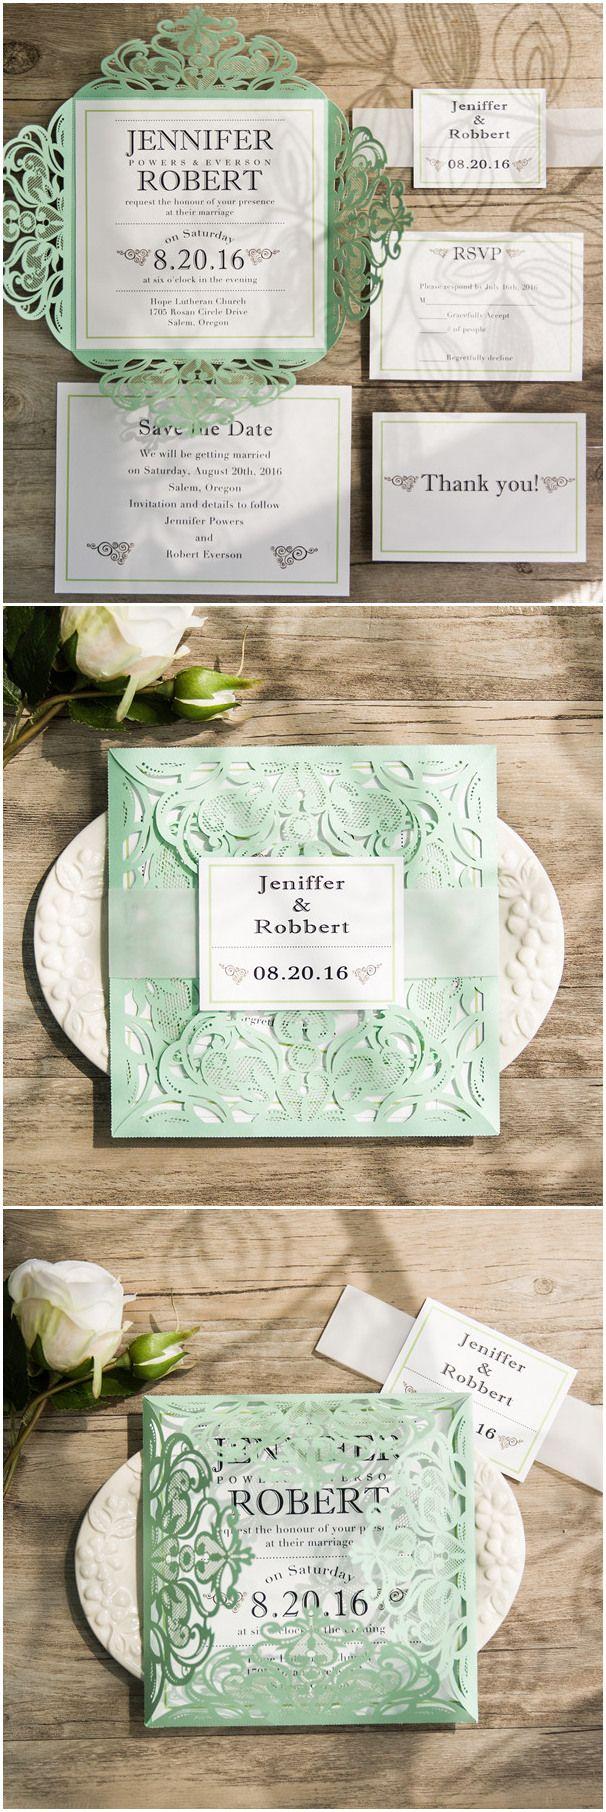 top wedding invitations016%0A summer wedding invitations    Best Mint Wedding Invitations Ideas On  Pinterest Mint and coral wedding invitations